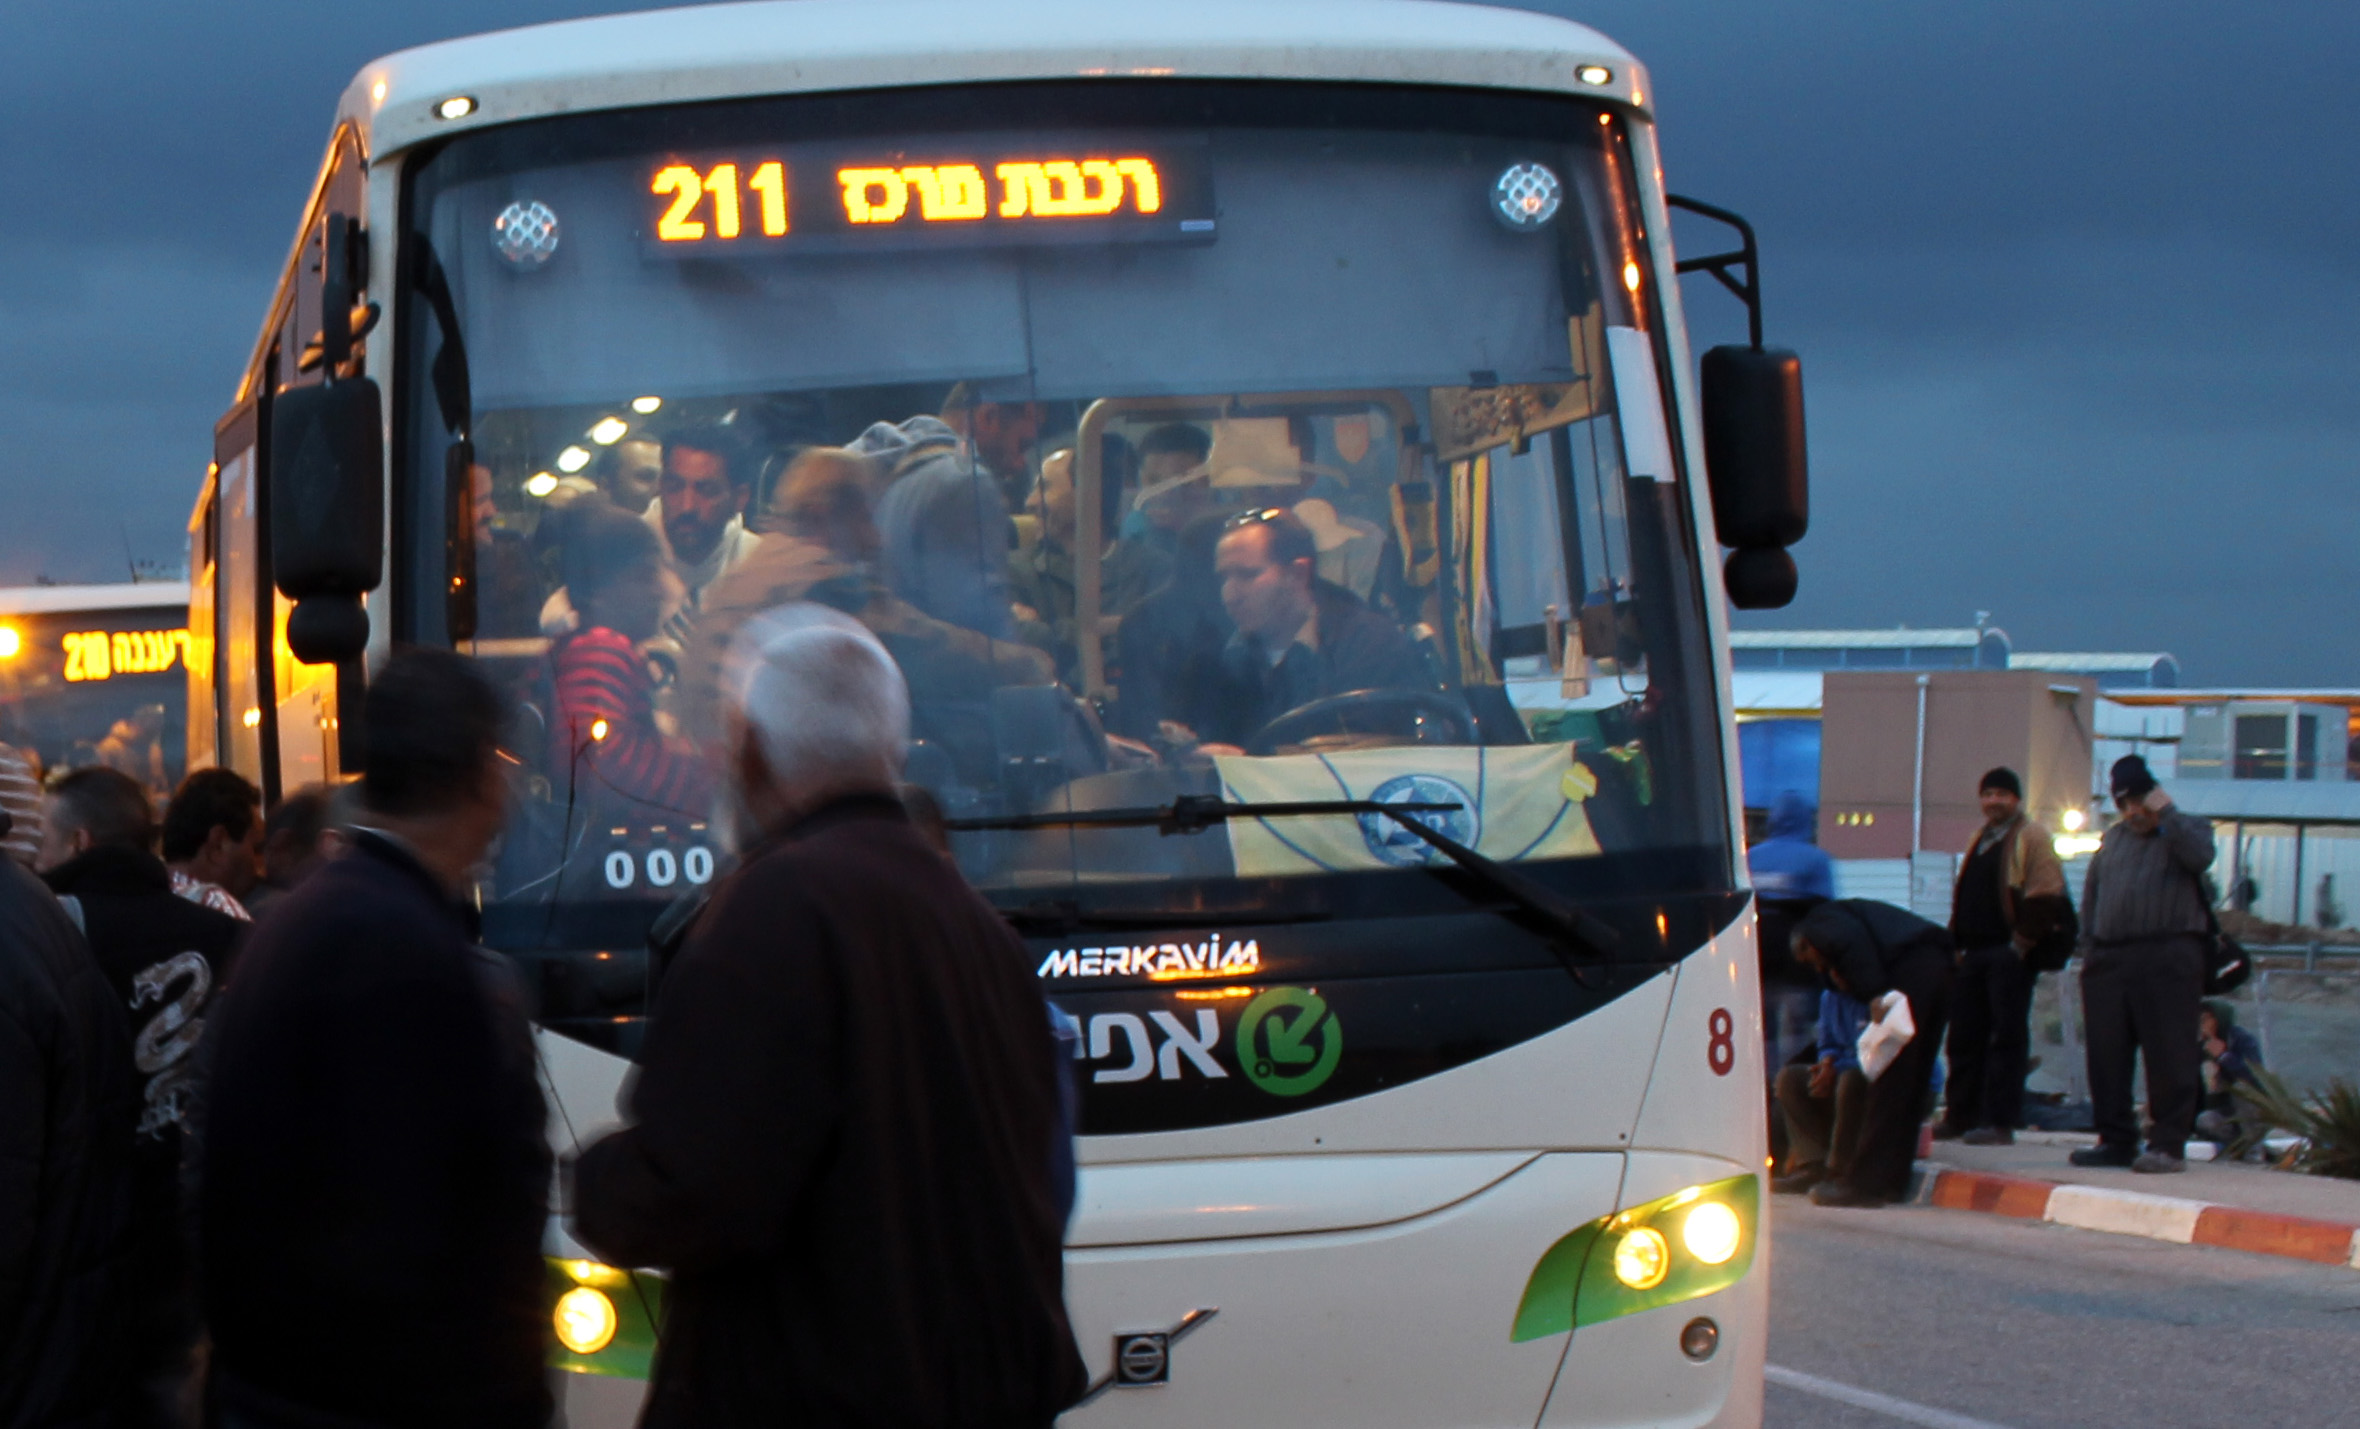 20130305 - Palestinian workers in front of bus.jpg